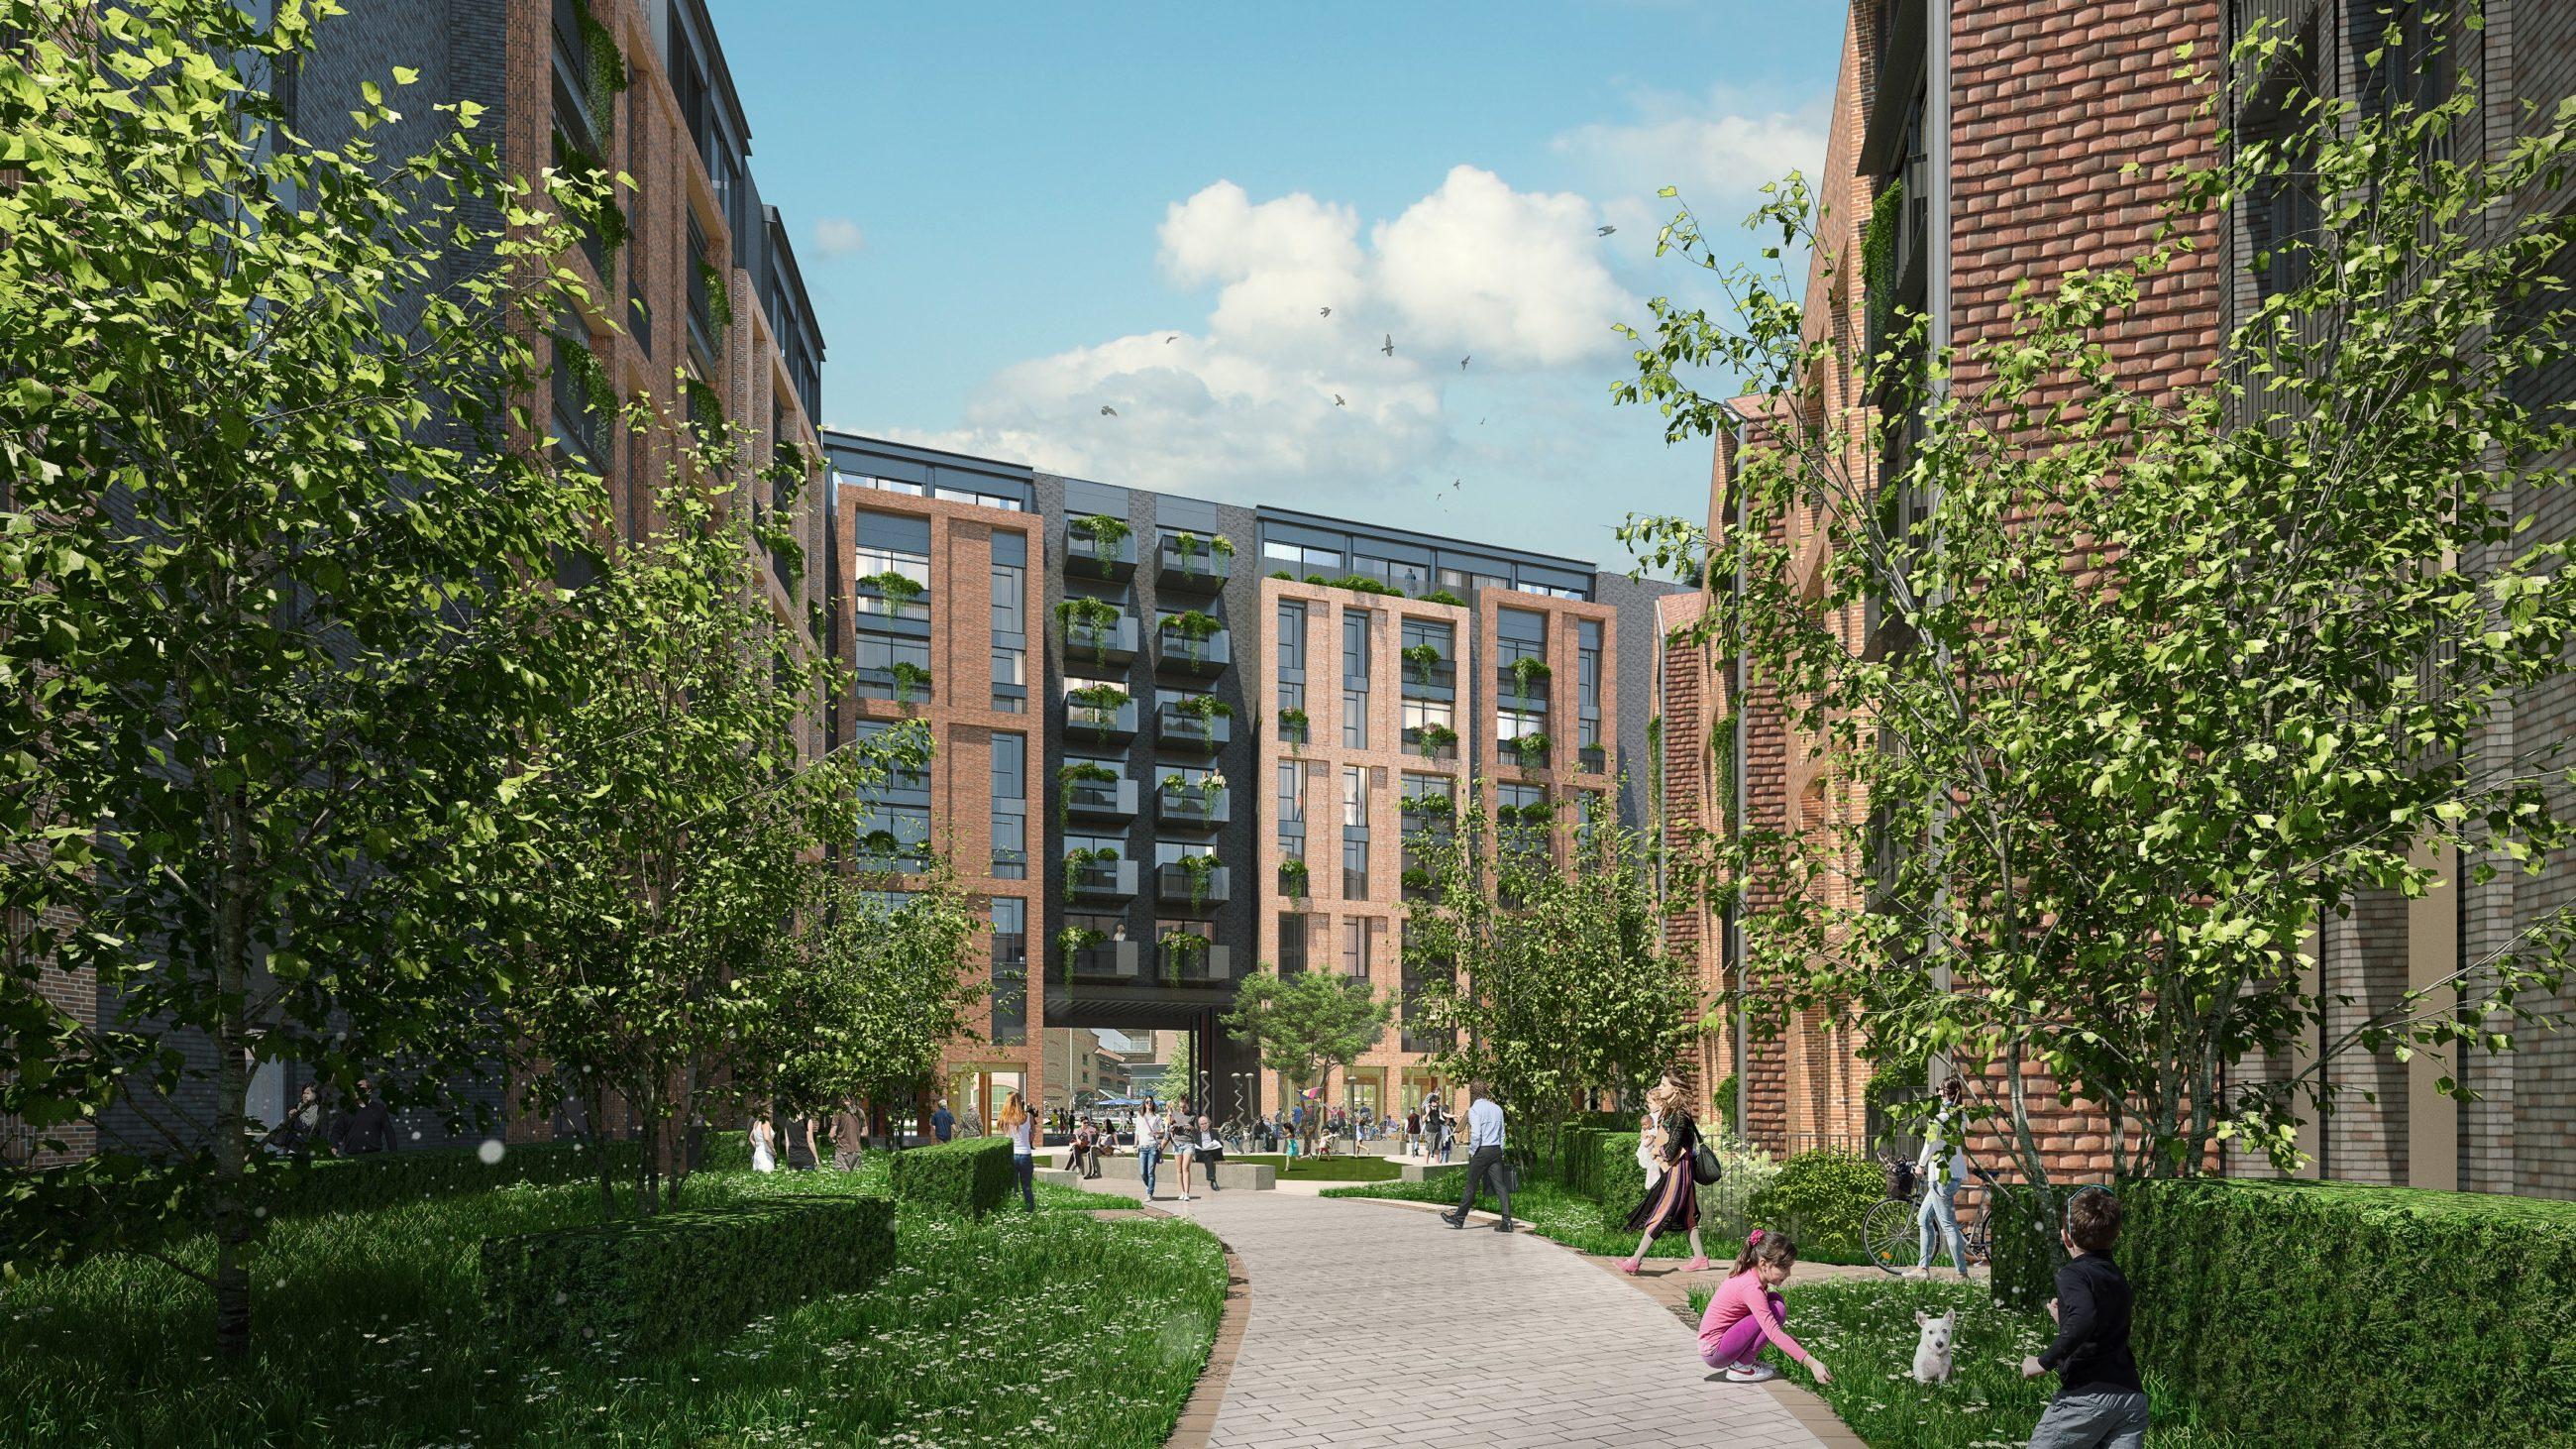 Walton-on-thames site render Eugene Marchese planning overhaul itv